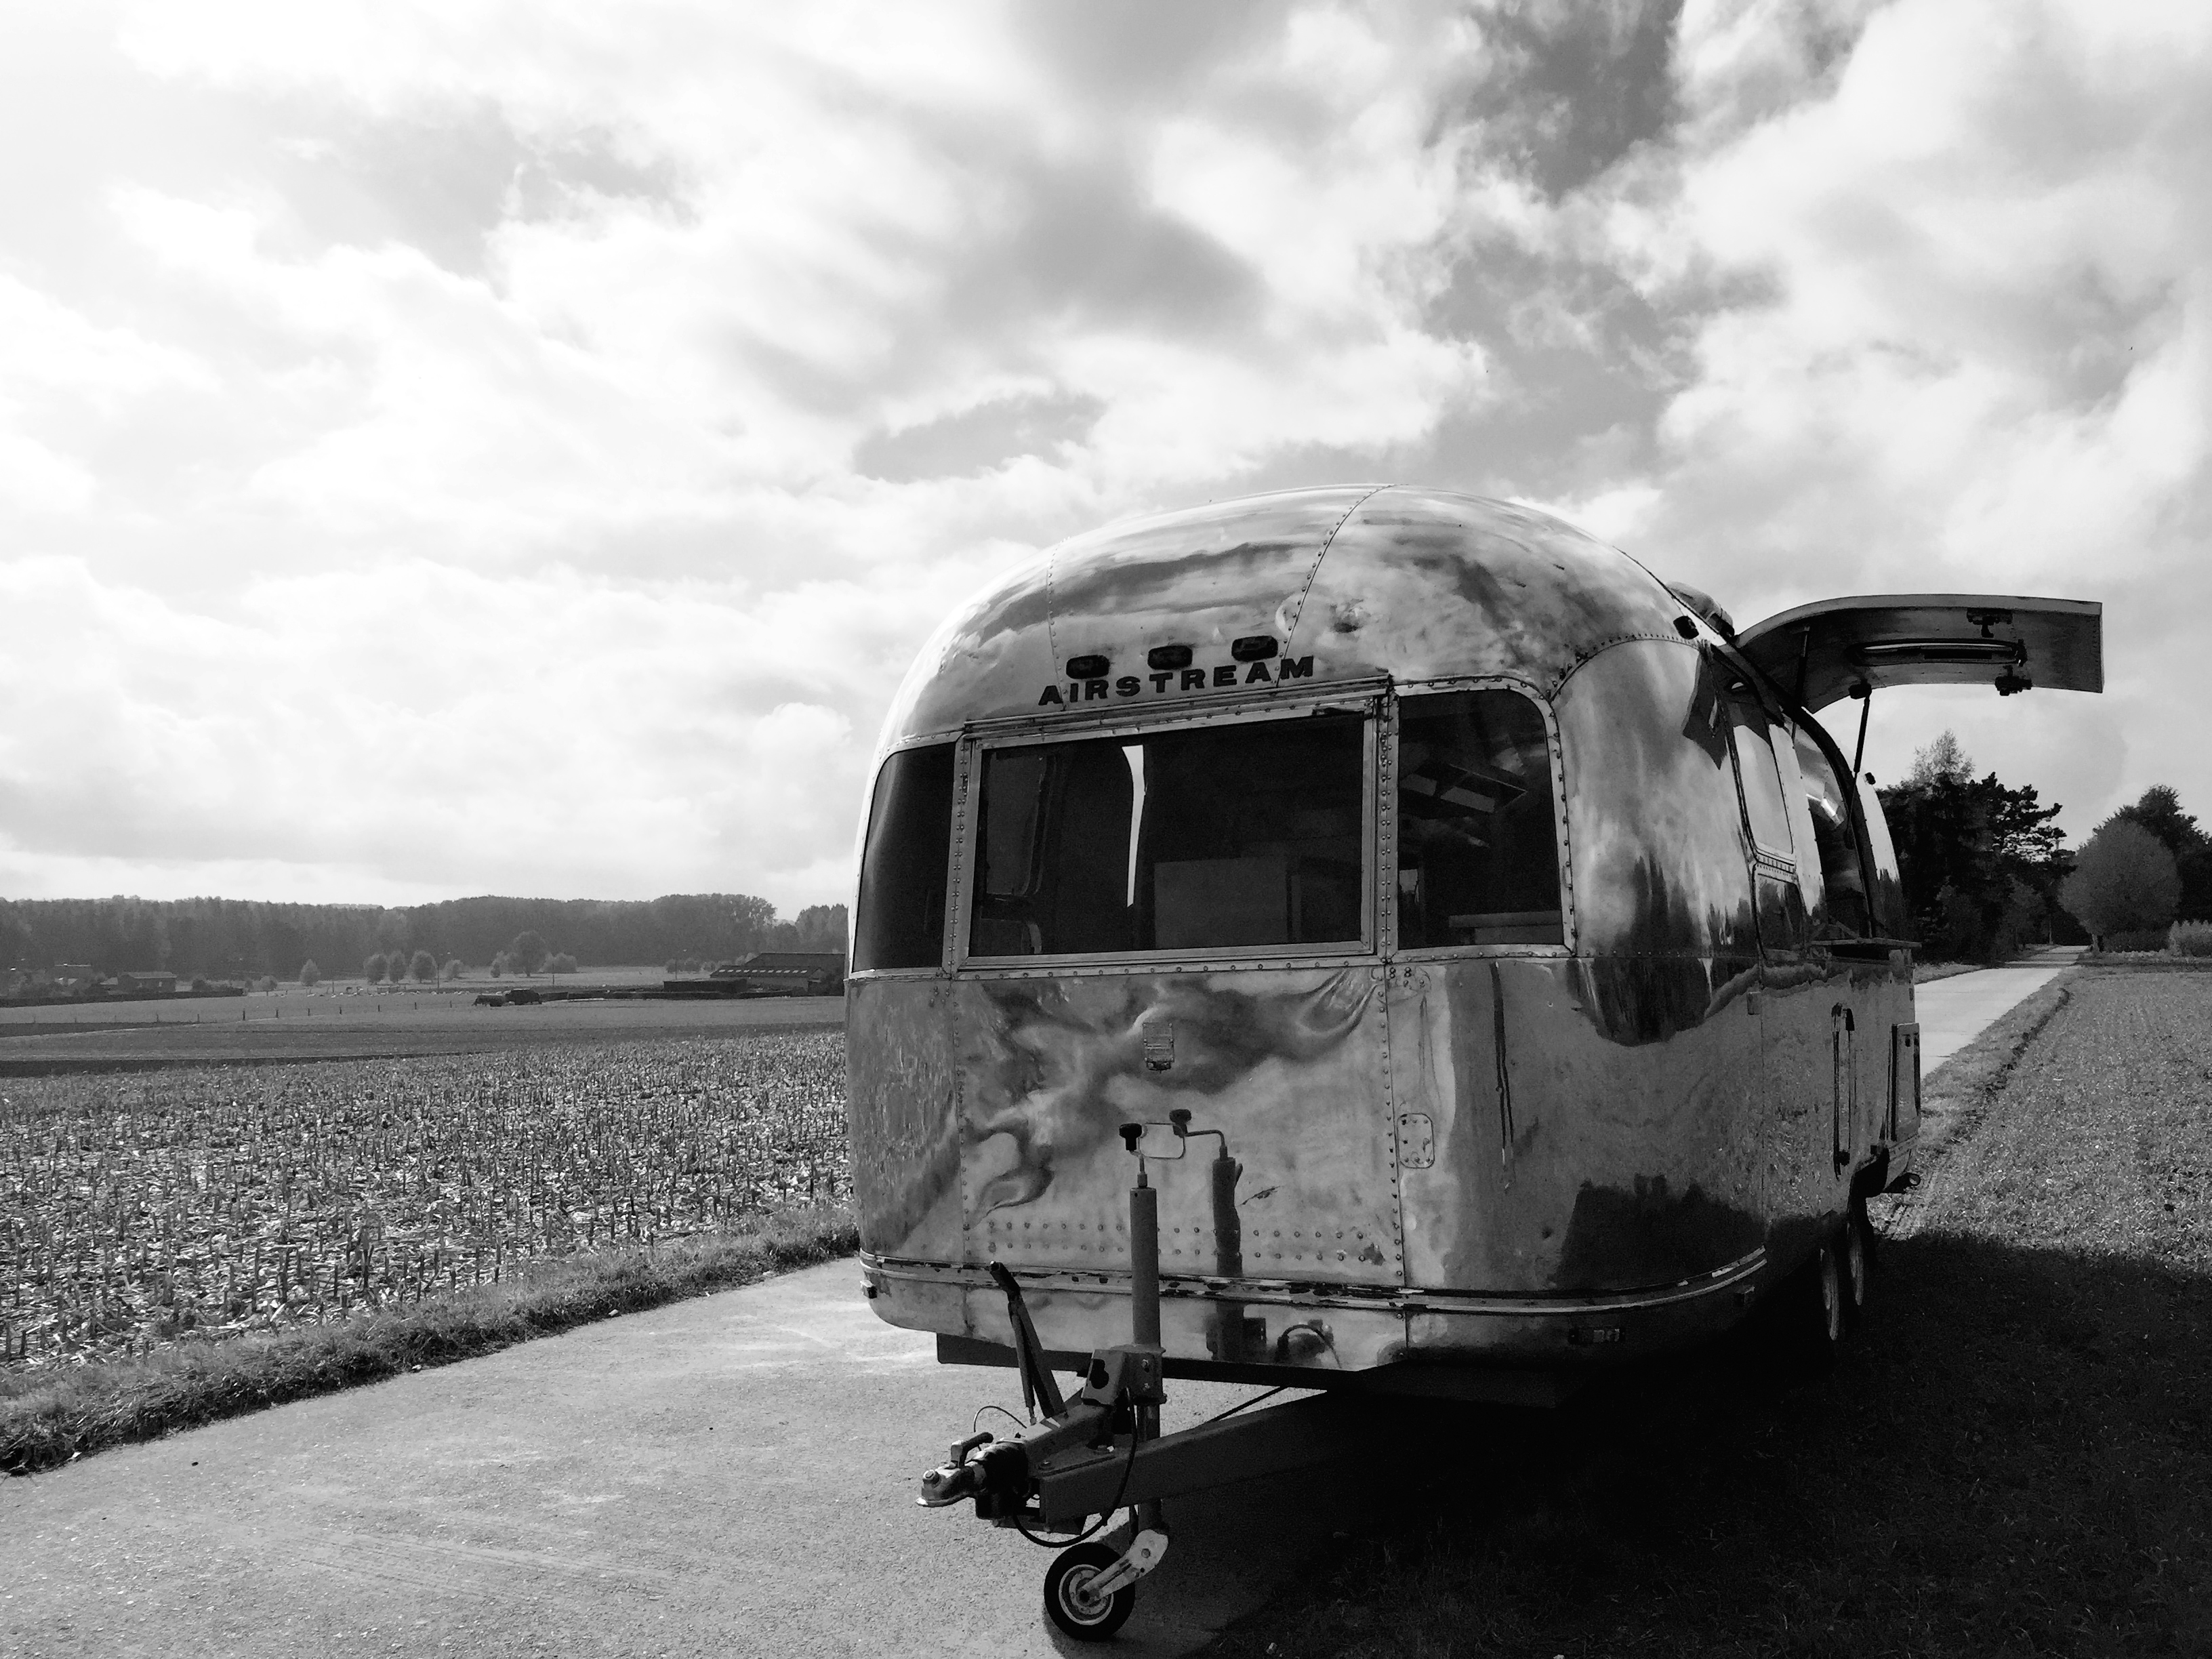 Airstream Mobile Kitchen